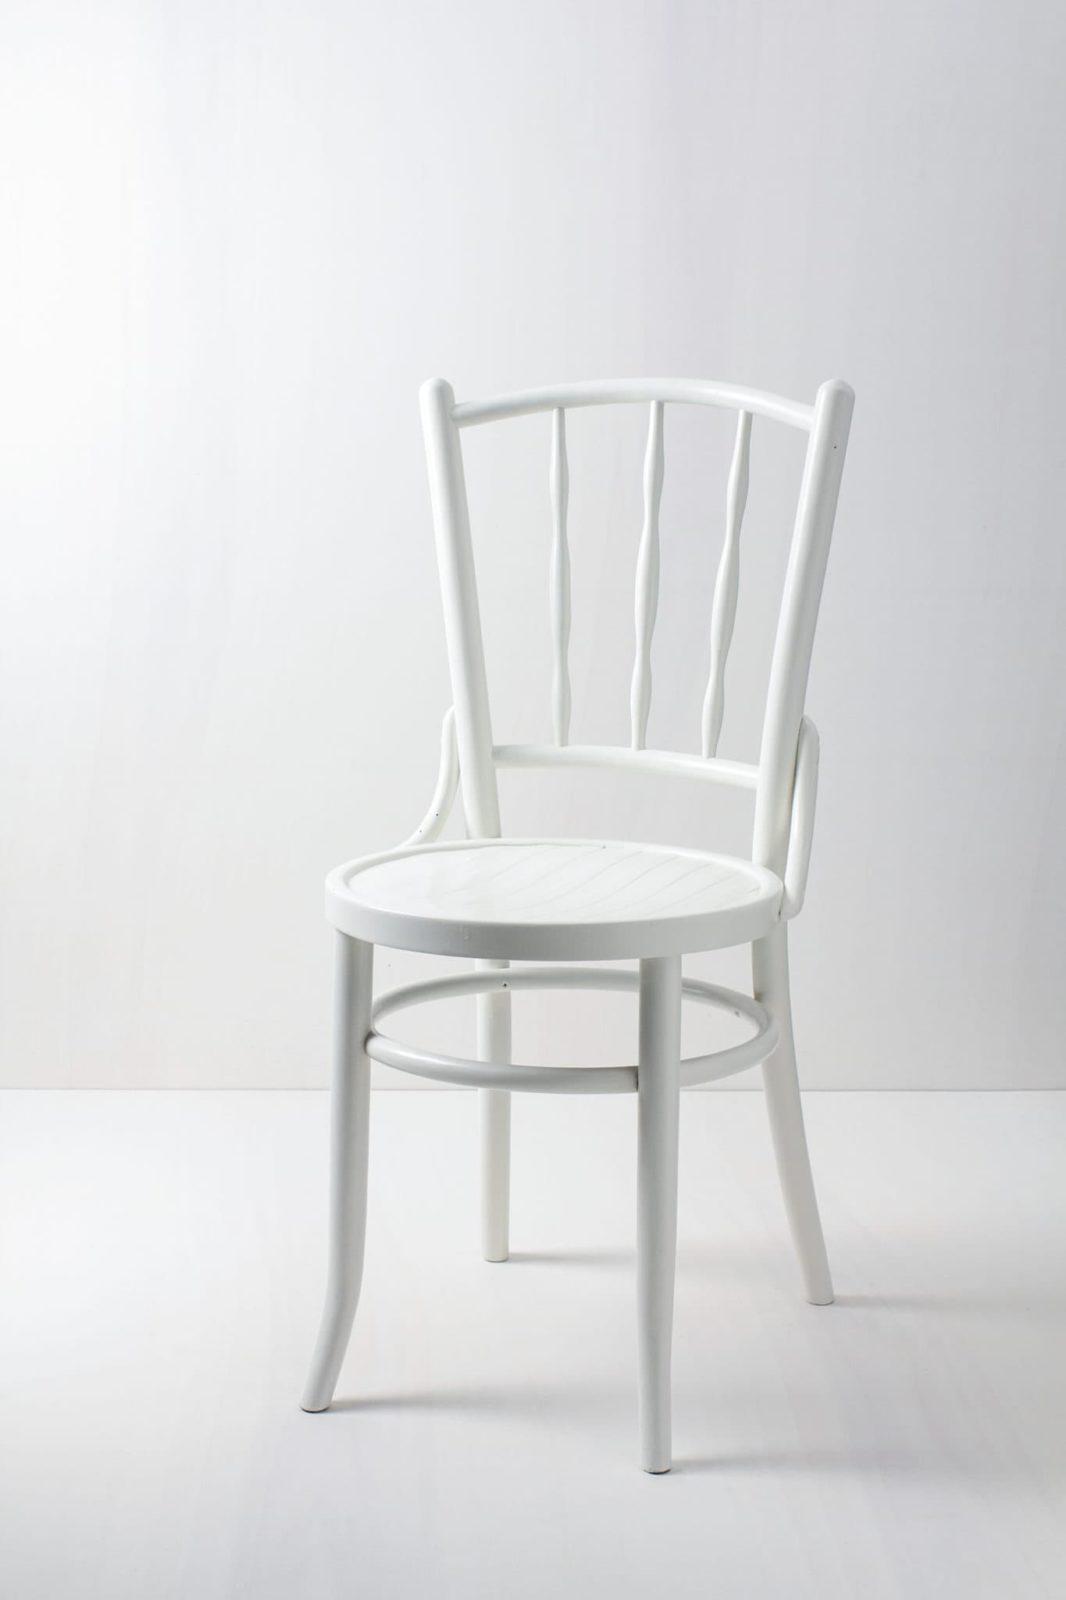 Holzstuhl Elena | Stuhl im Thonet-Stil, seidenmatt weiß lackiert. | gotvintage Rental & Event Design